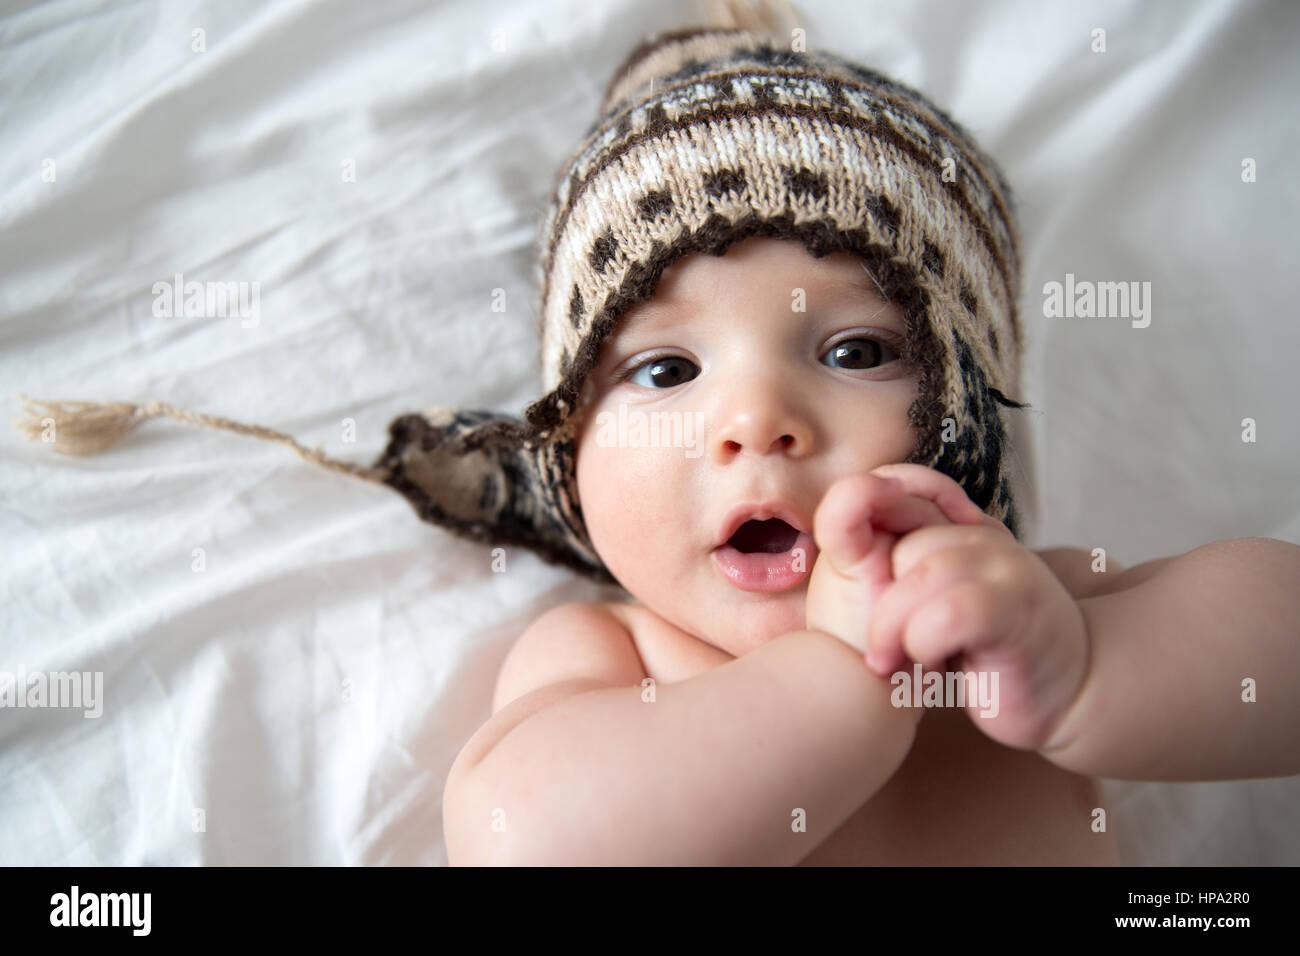 Un bebé de cuatro meses la joven viste un sombrero de alpaca chullo Imagen  De Stock a13906f34b9